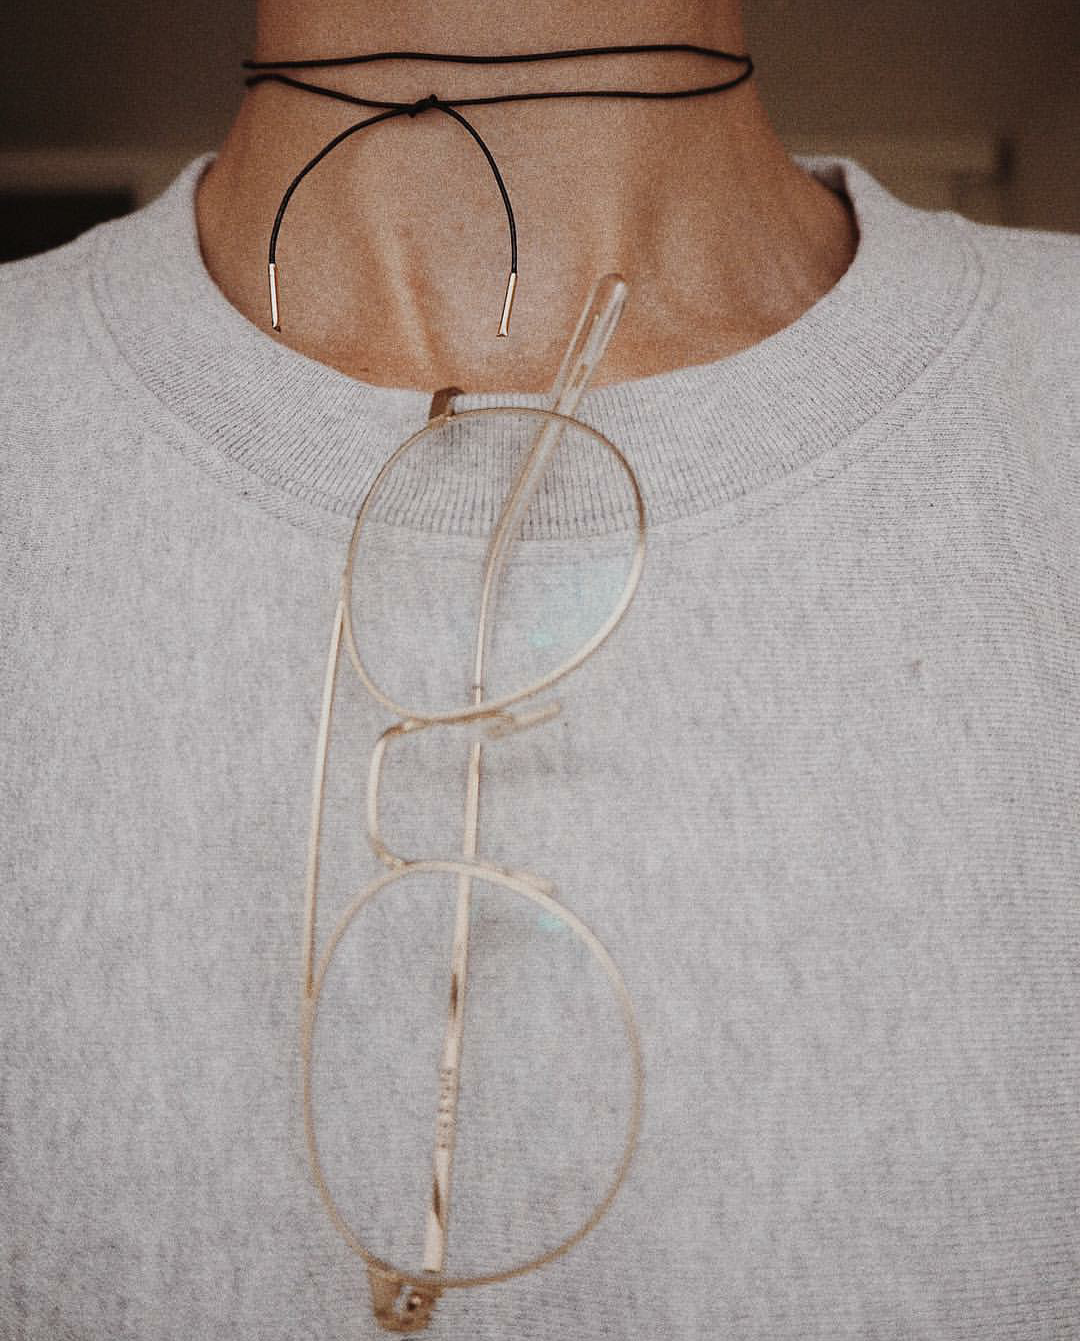 Clear glasses | Minimalist | Pinterest | Glass, Eyewear and Jewelry ...